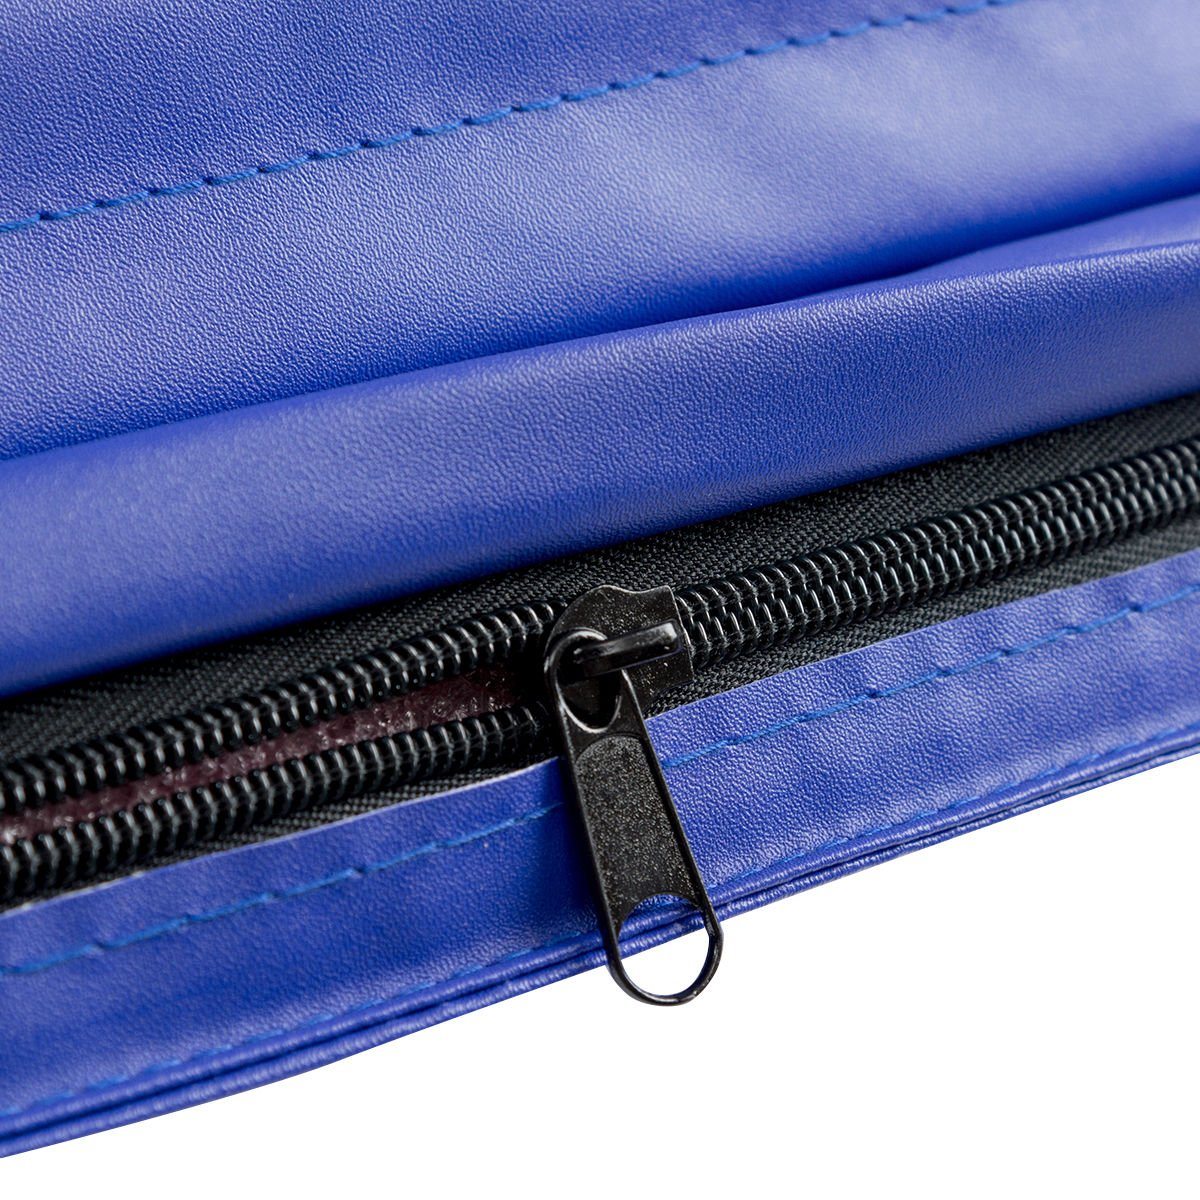 COSTWAY Blue Tri-Fold Gymnastics Mat 6X2 Folding Fitness Exercise W// Carrying Handles